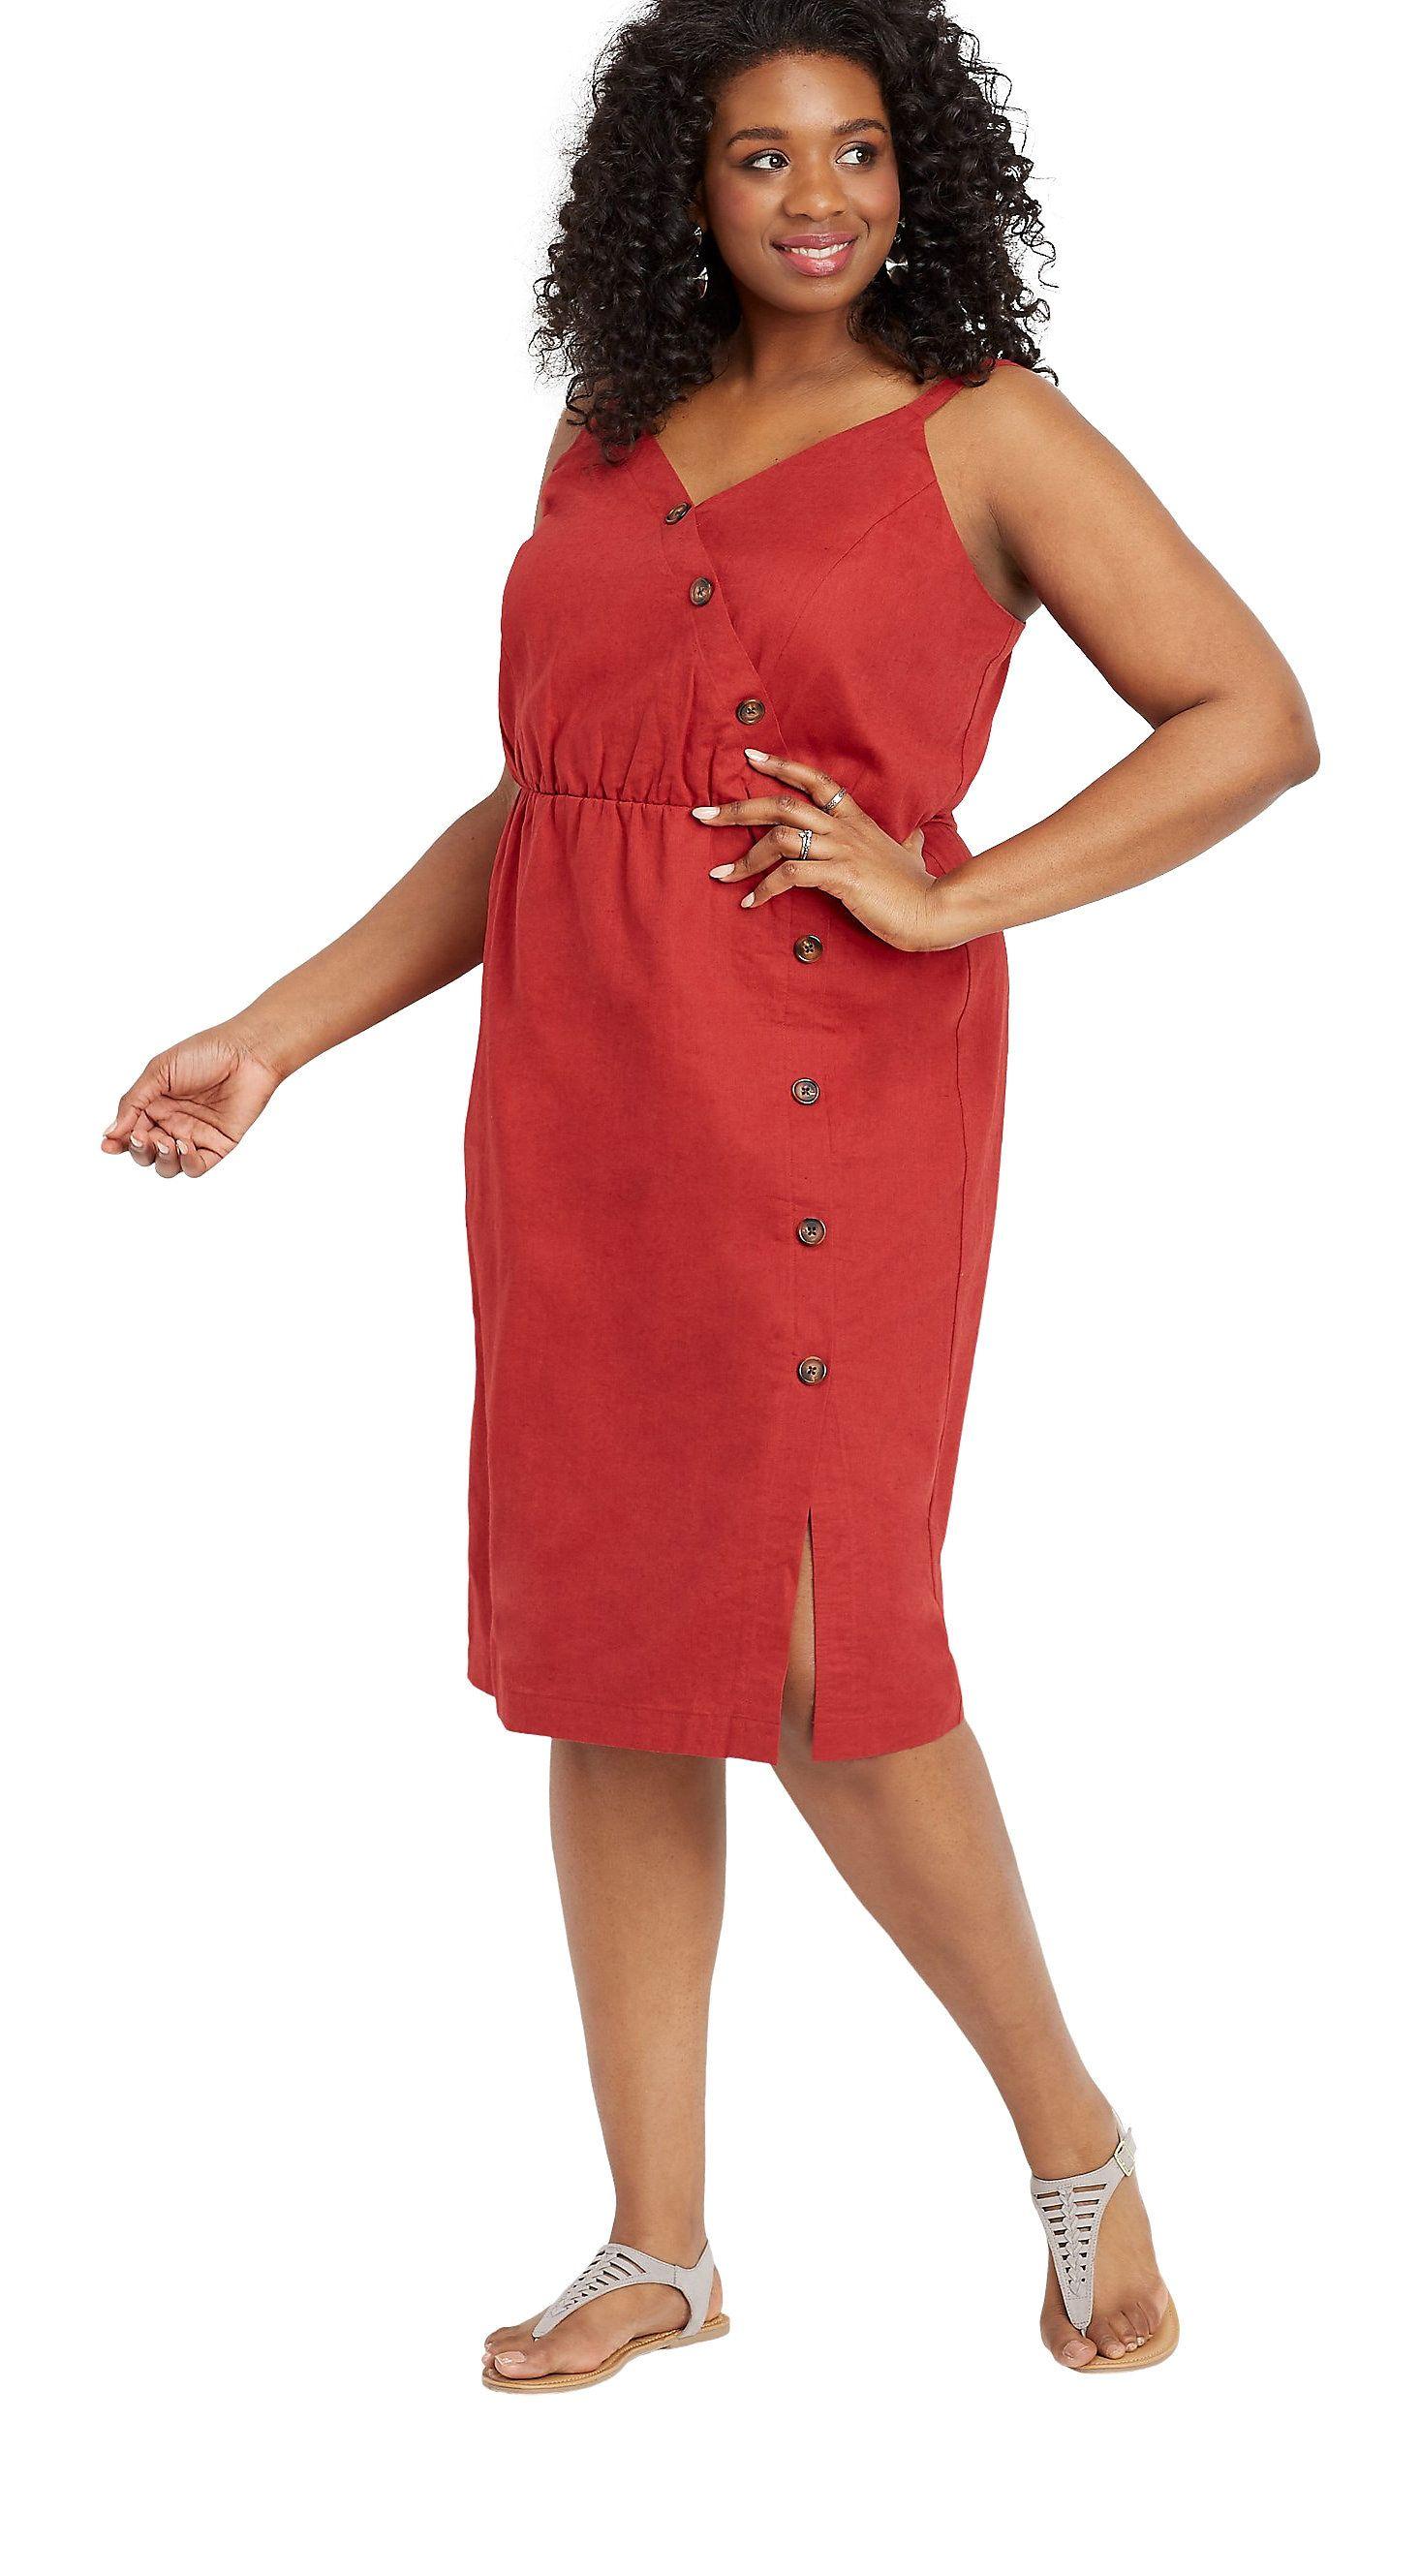 Plus Size Linen Button Front Dress Sponsored Plussize Walmartfashion Wedressamerica Looks [ 2659 x 1466 Pixel ]